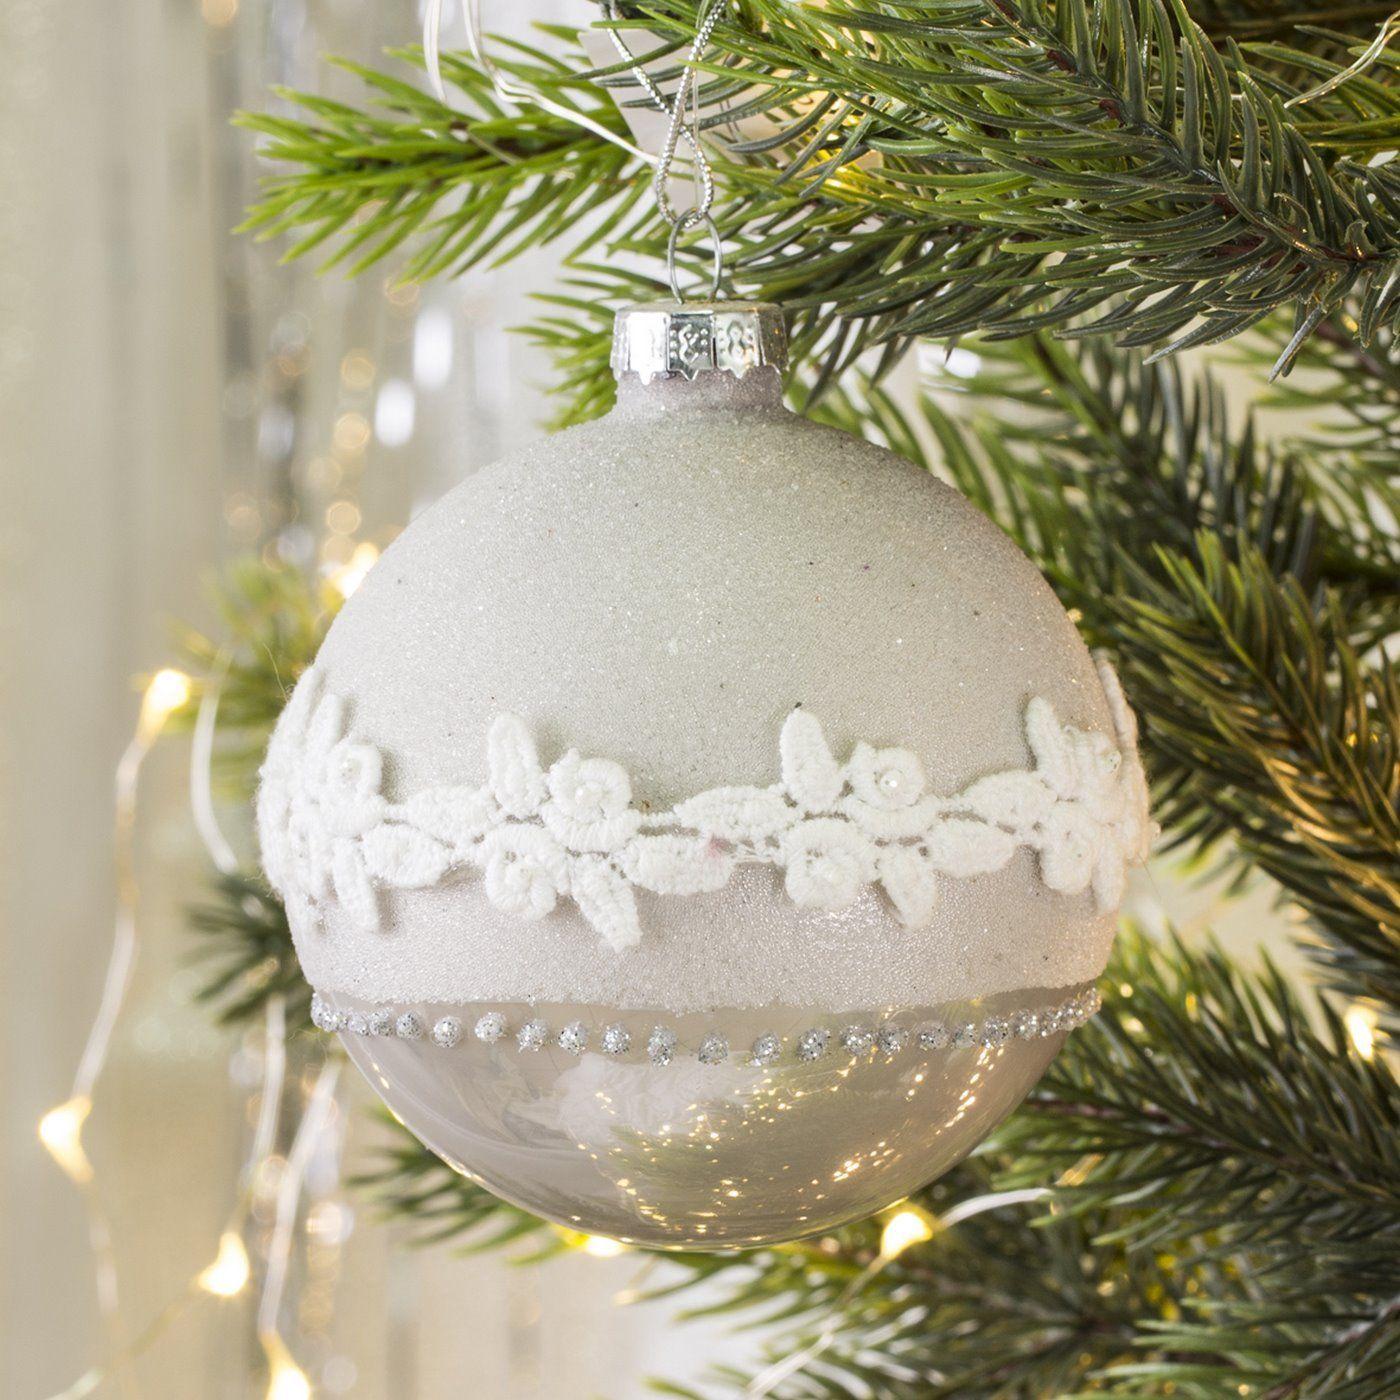 Bombka Vani Oryginalna Bombka Szklana Vani O Dwoch Fakturach Gladkiej I Lsniacej Oraz Obsypanej Drobnym Pia Christmas Bulbs Christmas Ornaments Holiday Decor